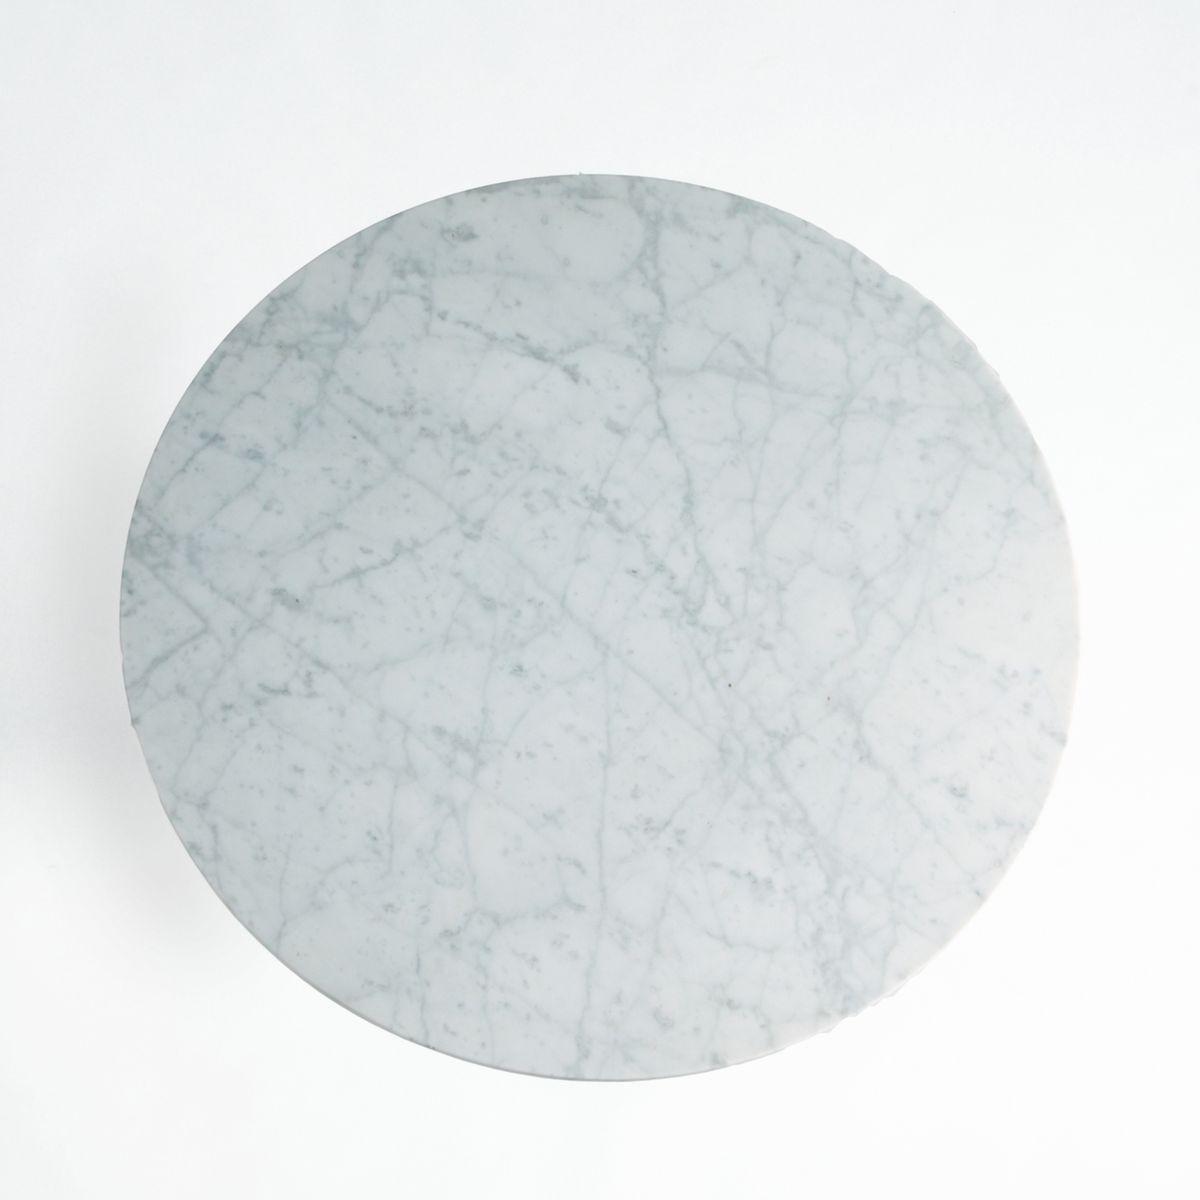 Plateau de table marbre Ø75 cm, Aradan a2dfc3c14ef6